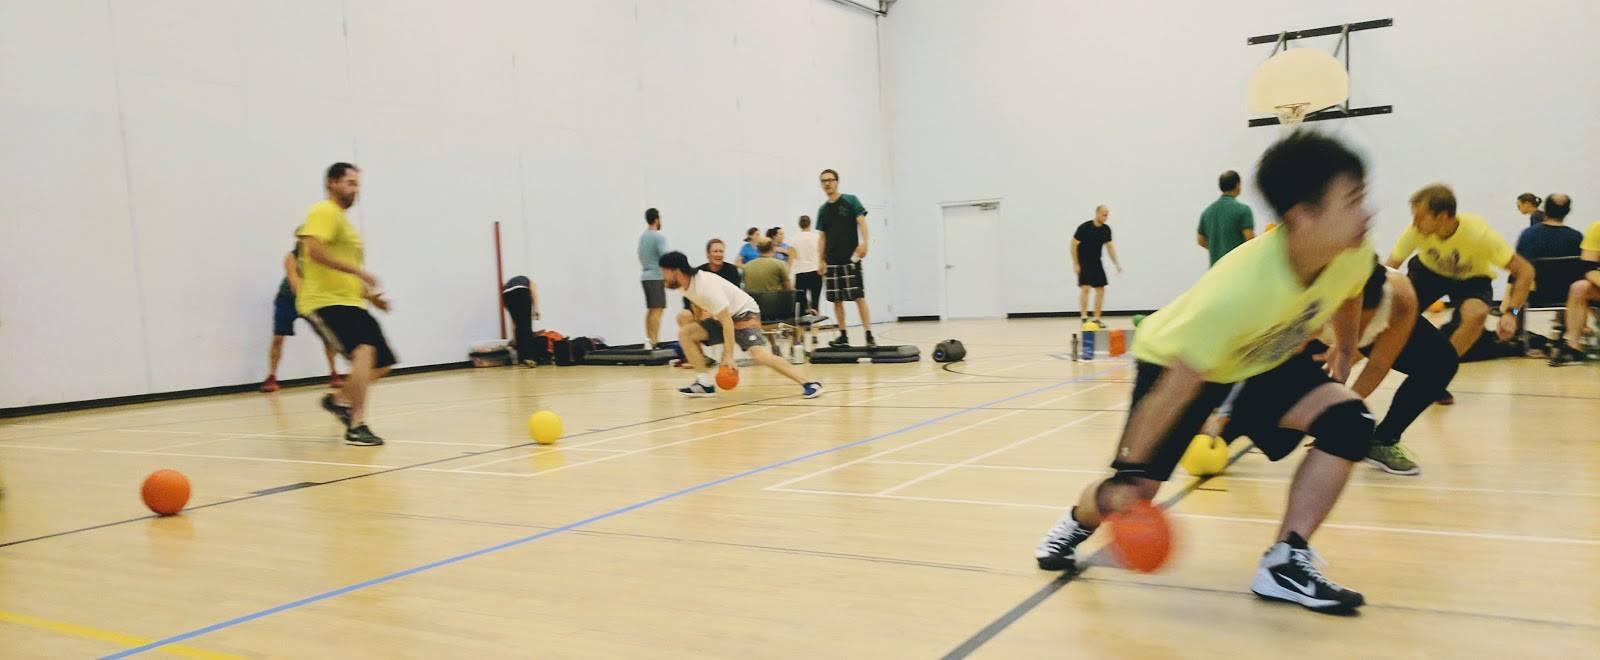 Adult co-ed rec dodgeball league in Saskatoon